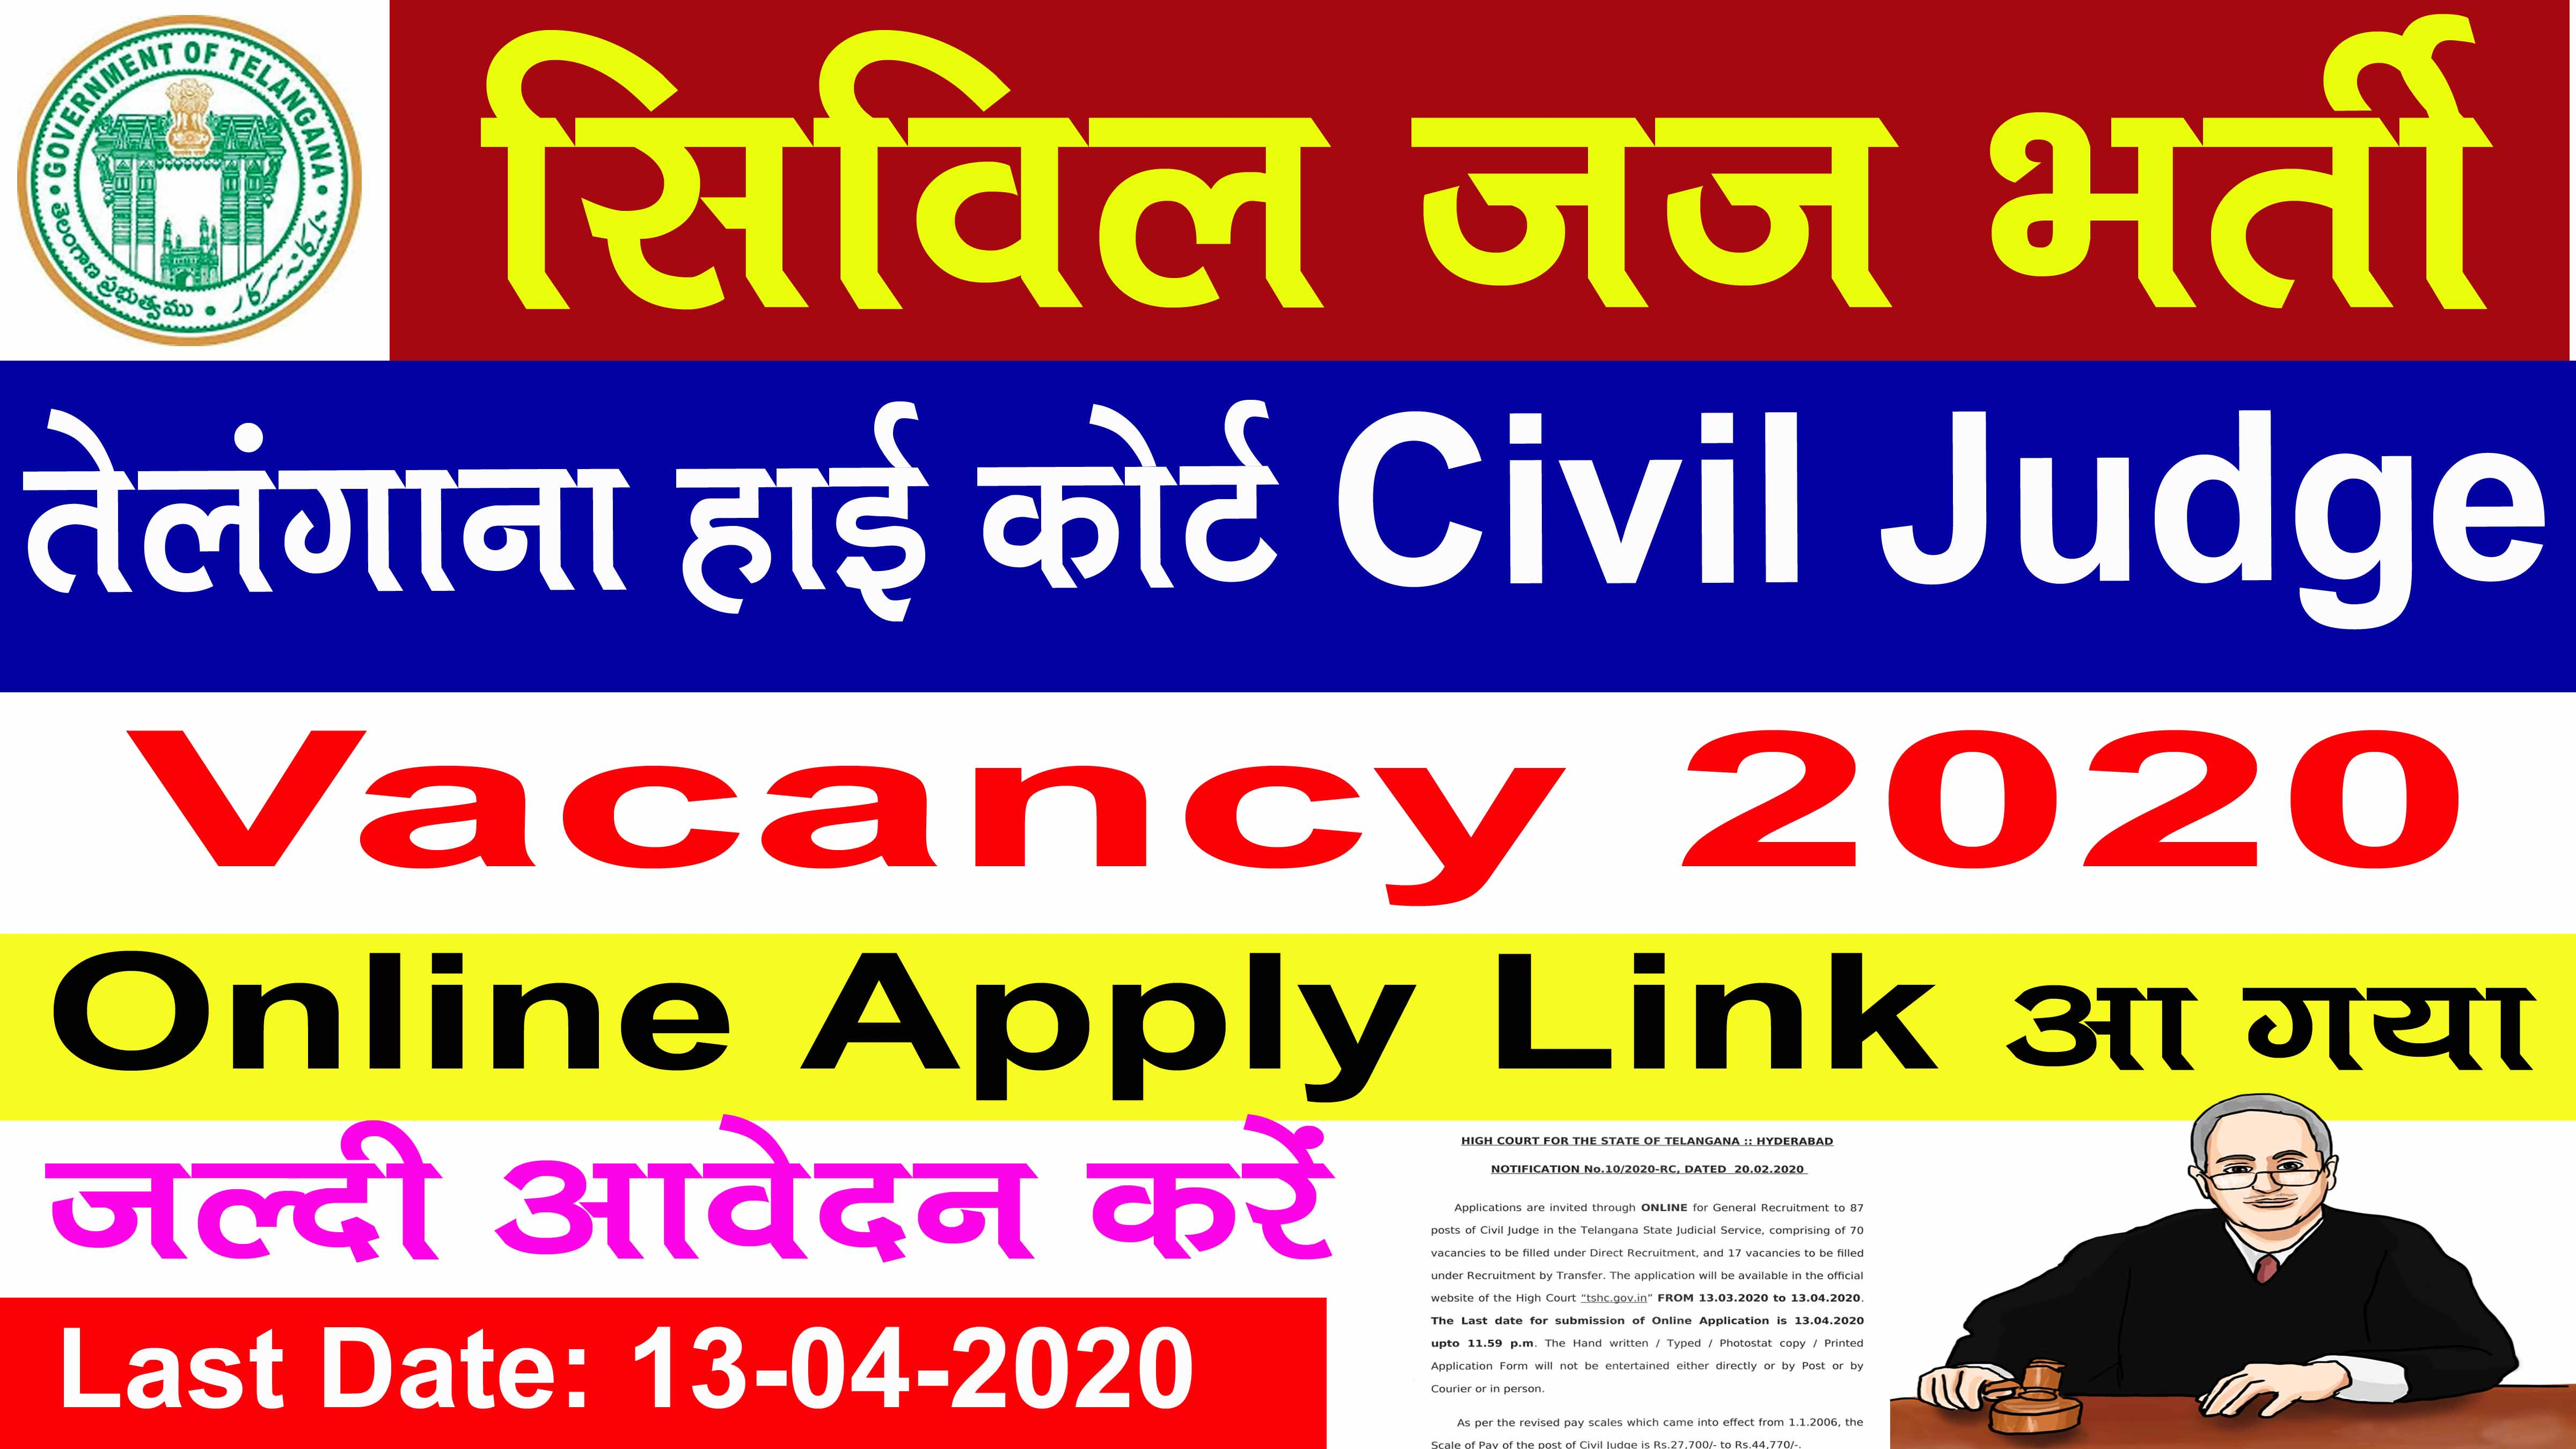 Telangana High Court Notification 2020